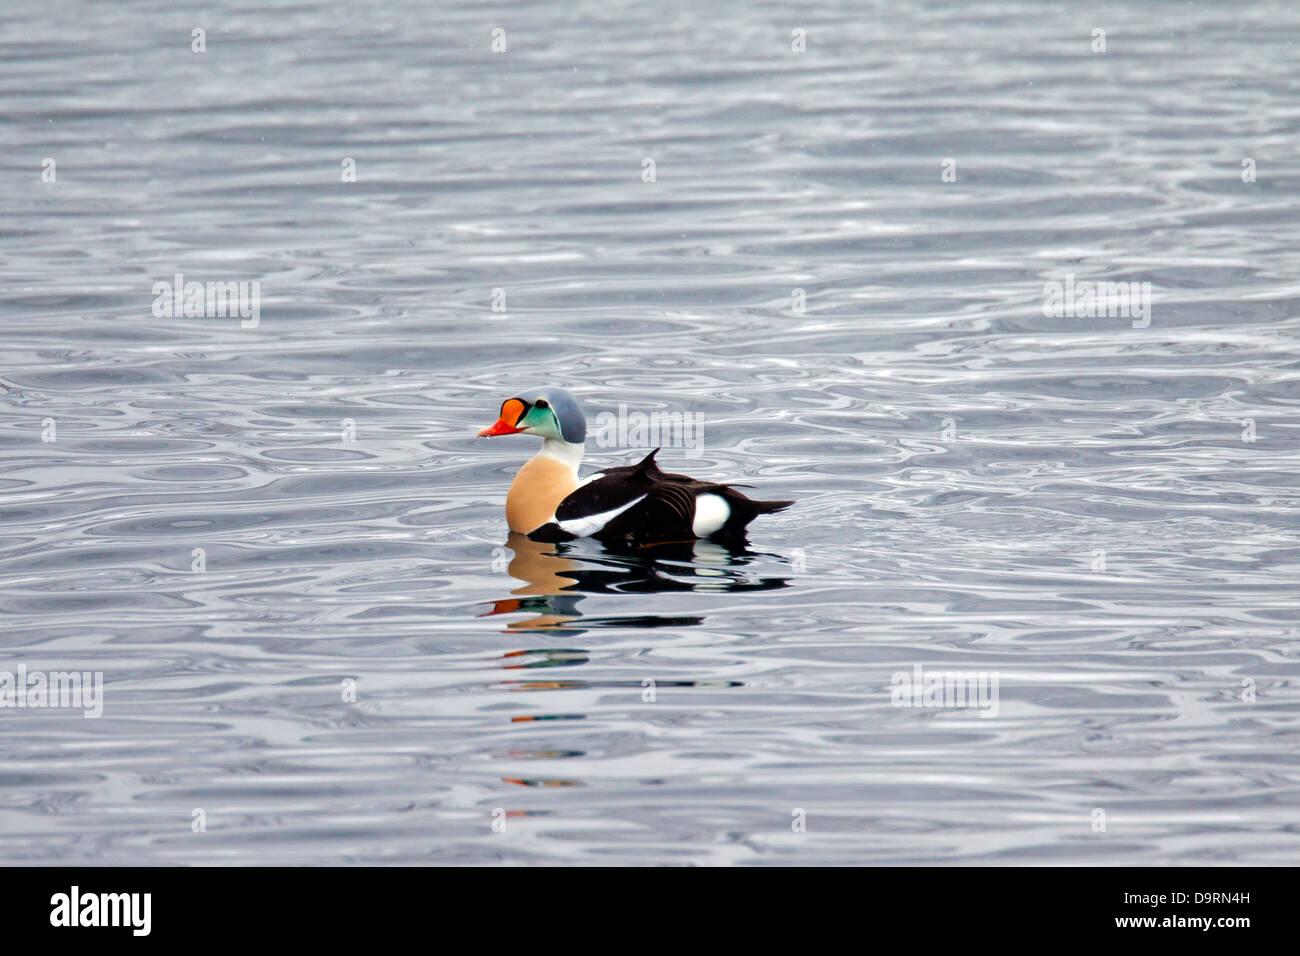 King Eider (Somateria spectabilis) duck in breeding plumage swimming in sea, Lofoten Islands, Norway - Stock Image